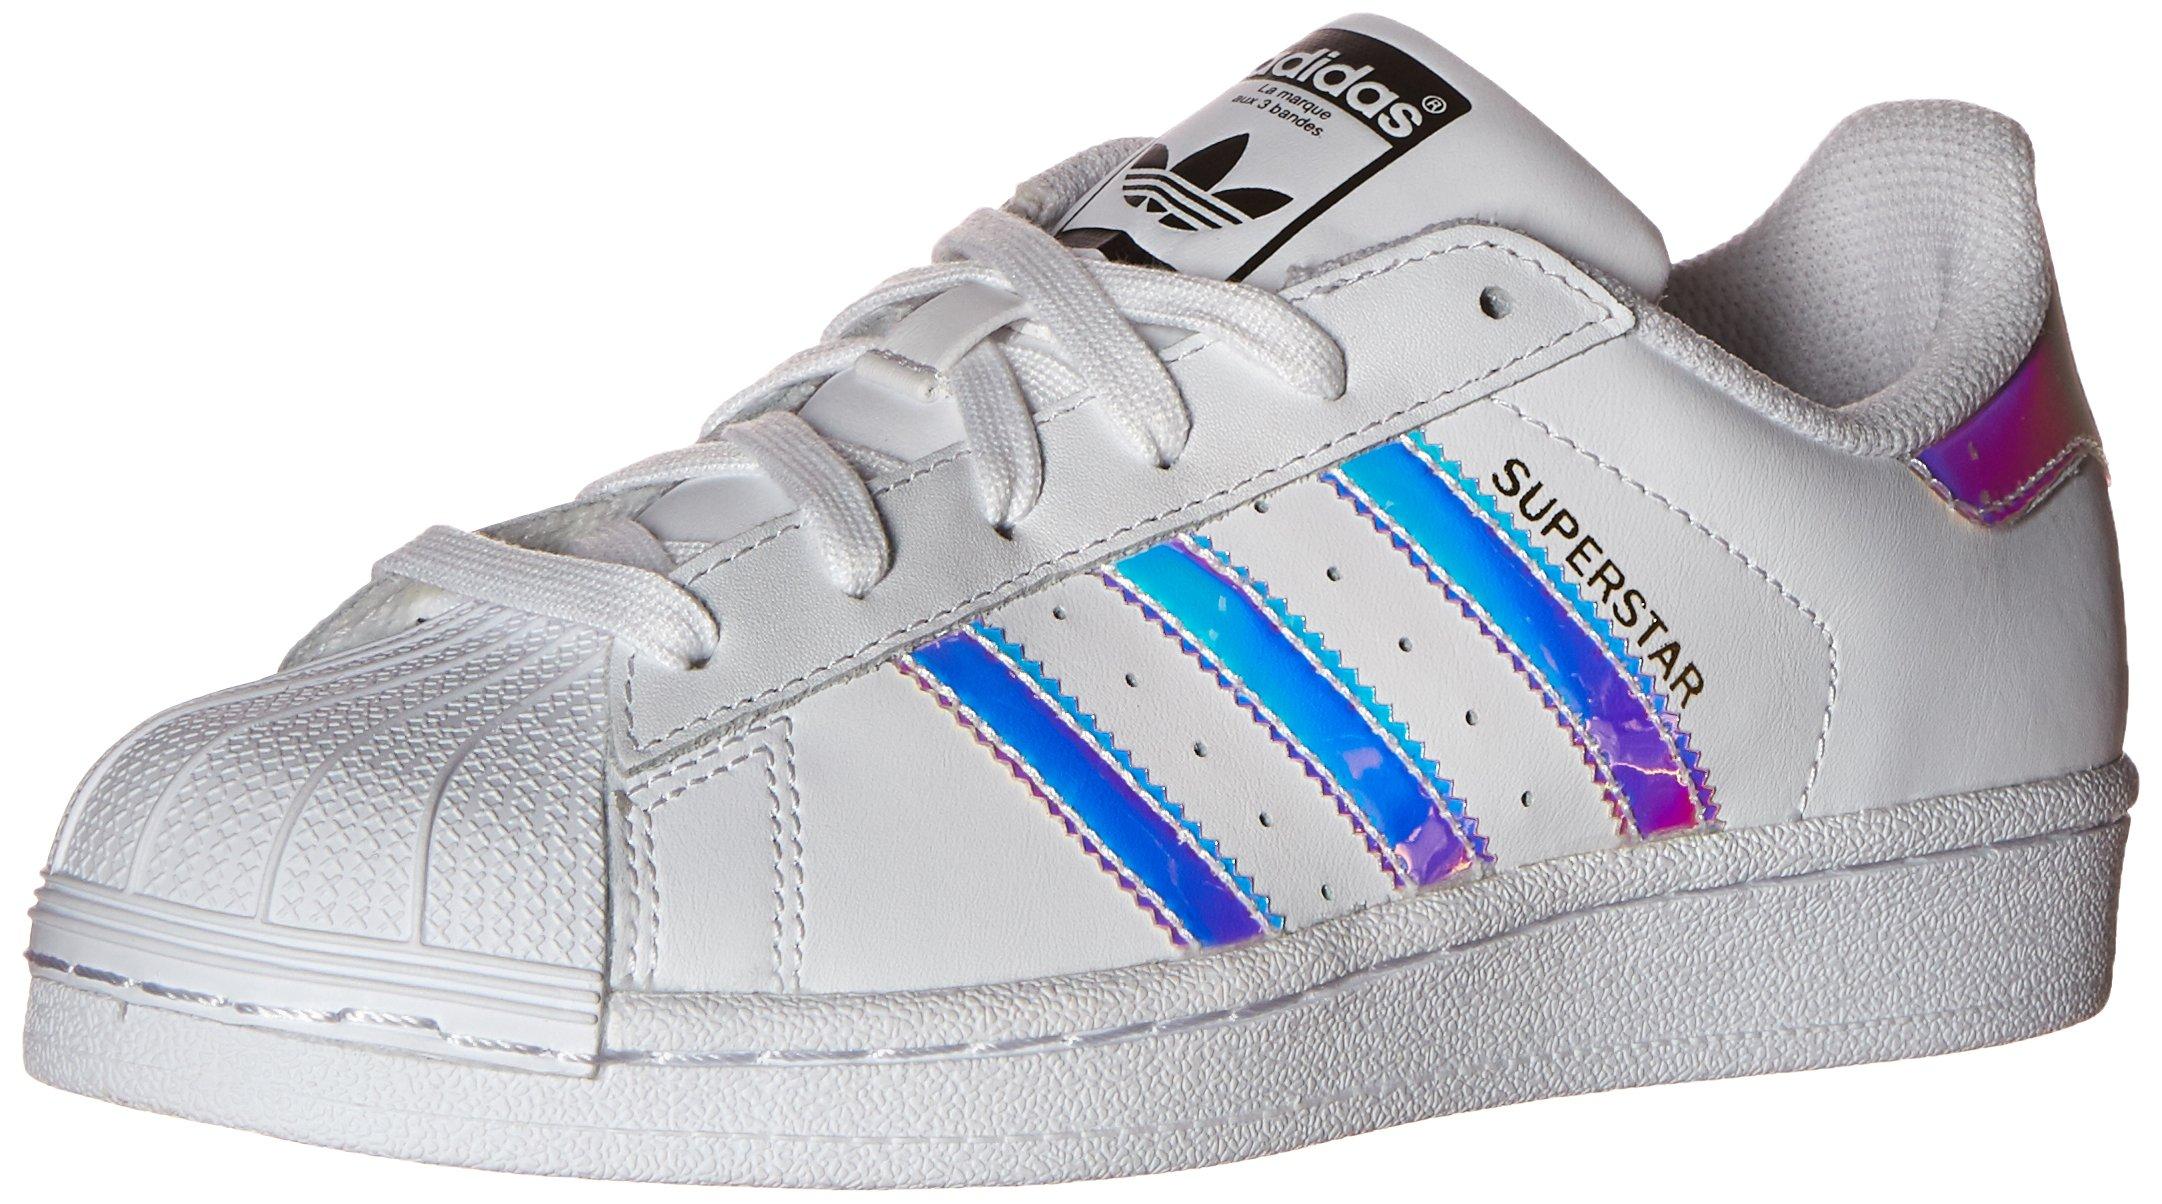 adidas Originals Kid's Superstar J Shoe, White/White/Metallic Silver, 4 M US Big Kid by adidas Originals (Image #1)